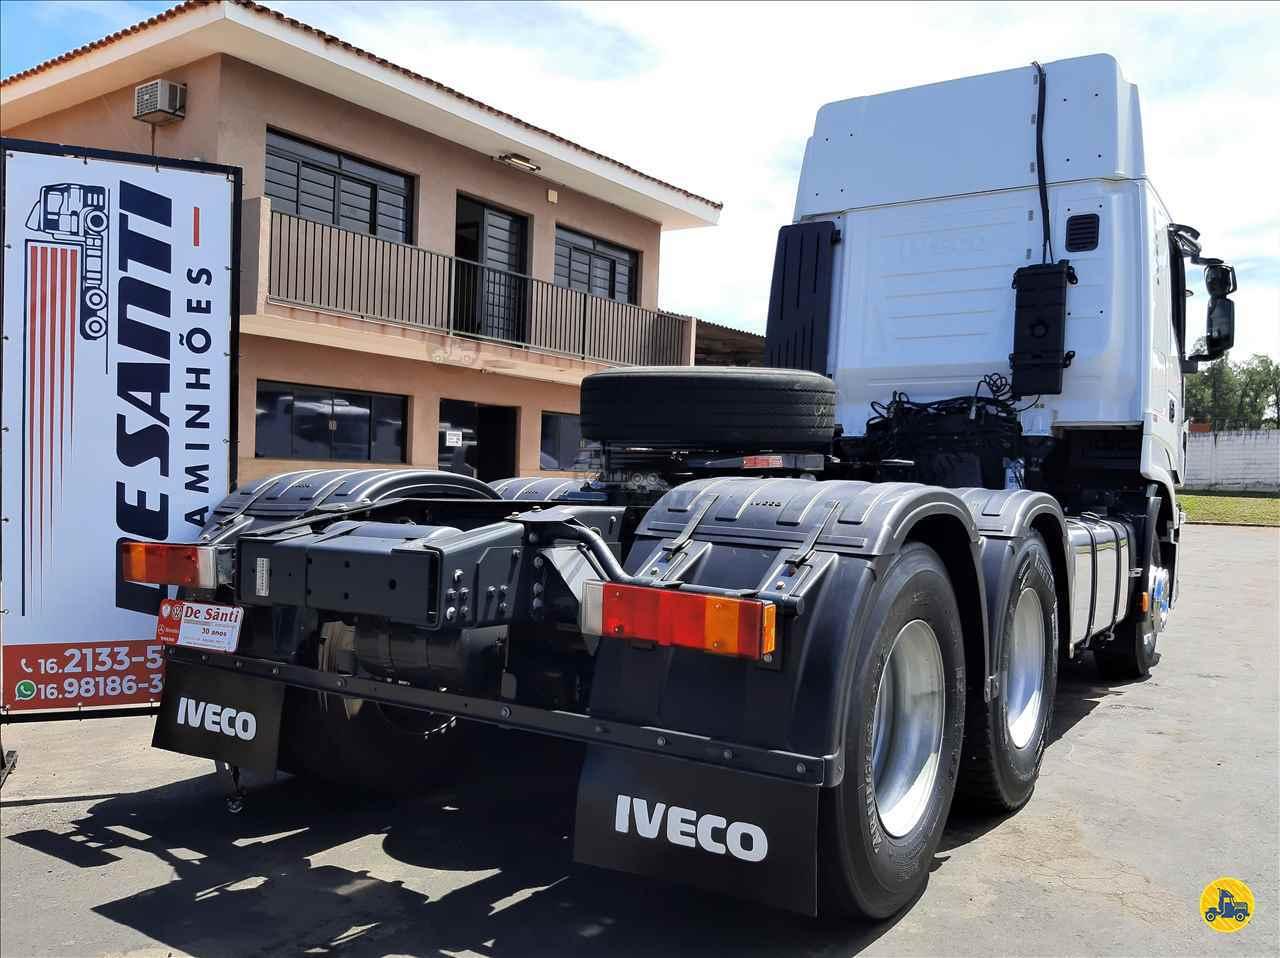 IVECO STRALIS 440 127956km 2019/2019 De Santi Caminhões